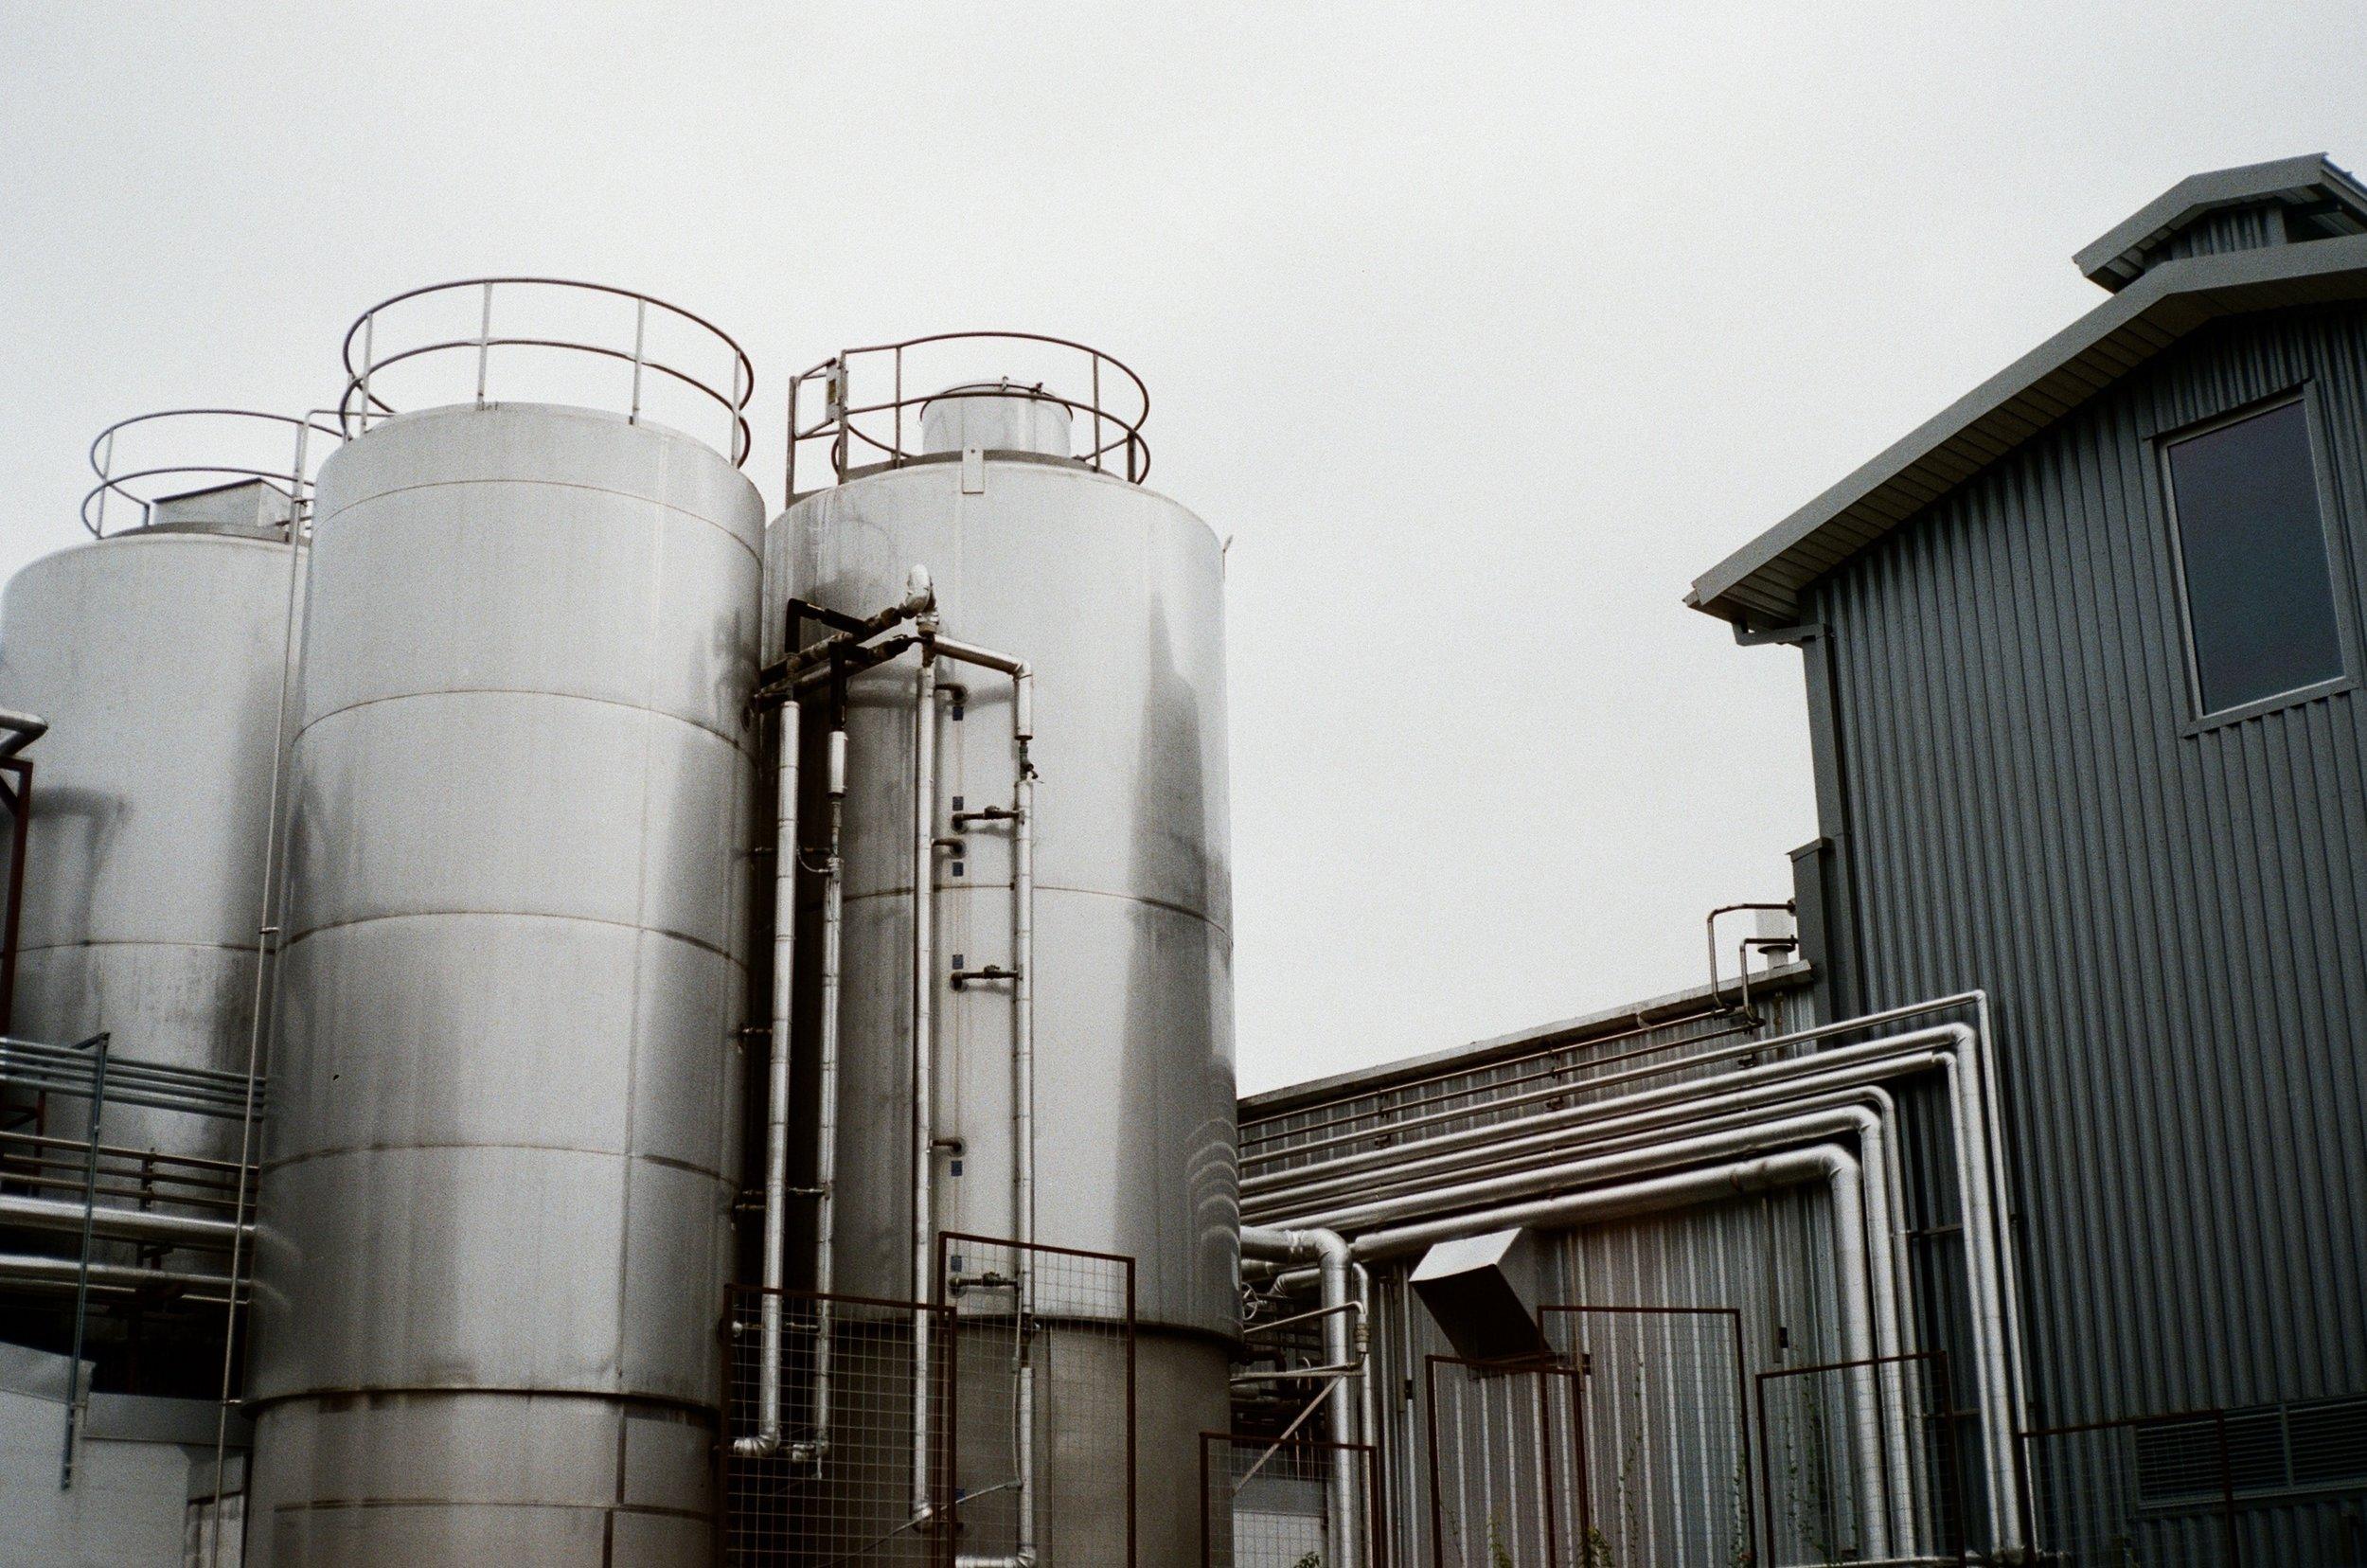 Real Ale Brewing Company  Ricoh 35 EFS | Fujifilm Superia 400  by Lynn Cano